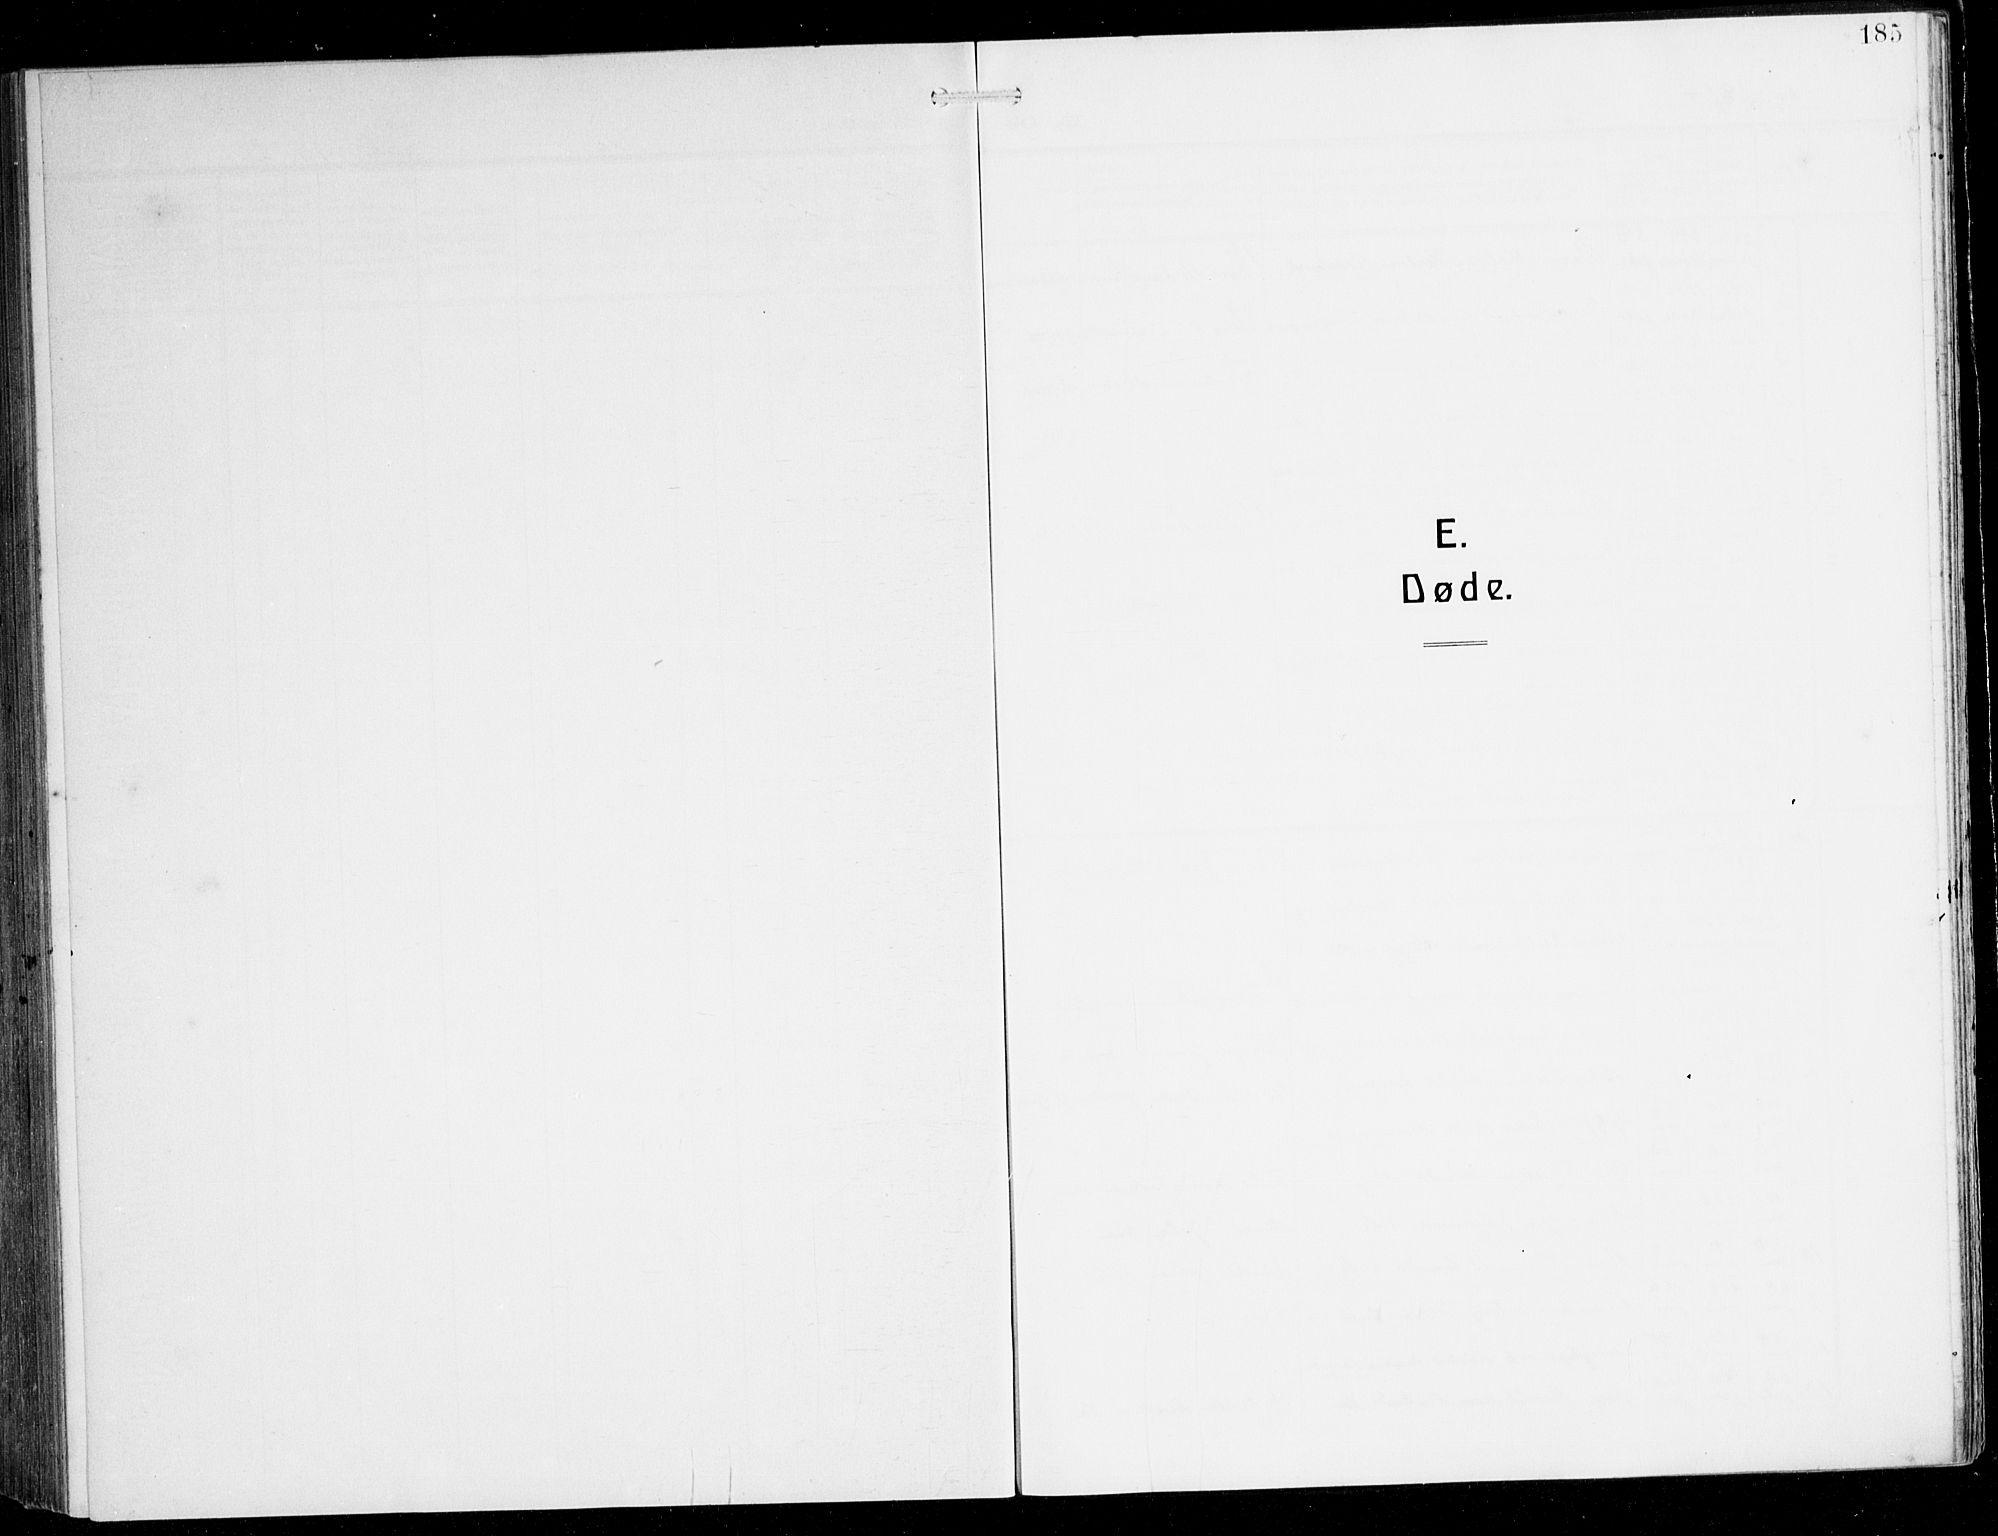 SAB, Herdla Sokneprestembete, H/Hab: Klokkerbok nr. C 2, 1913-1926, s. 185